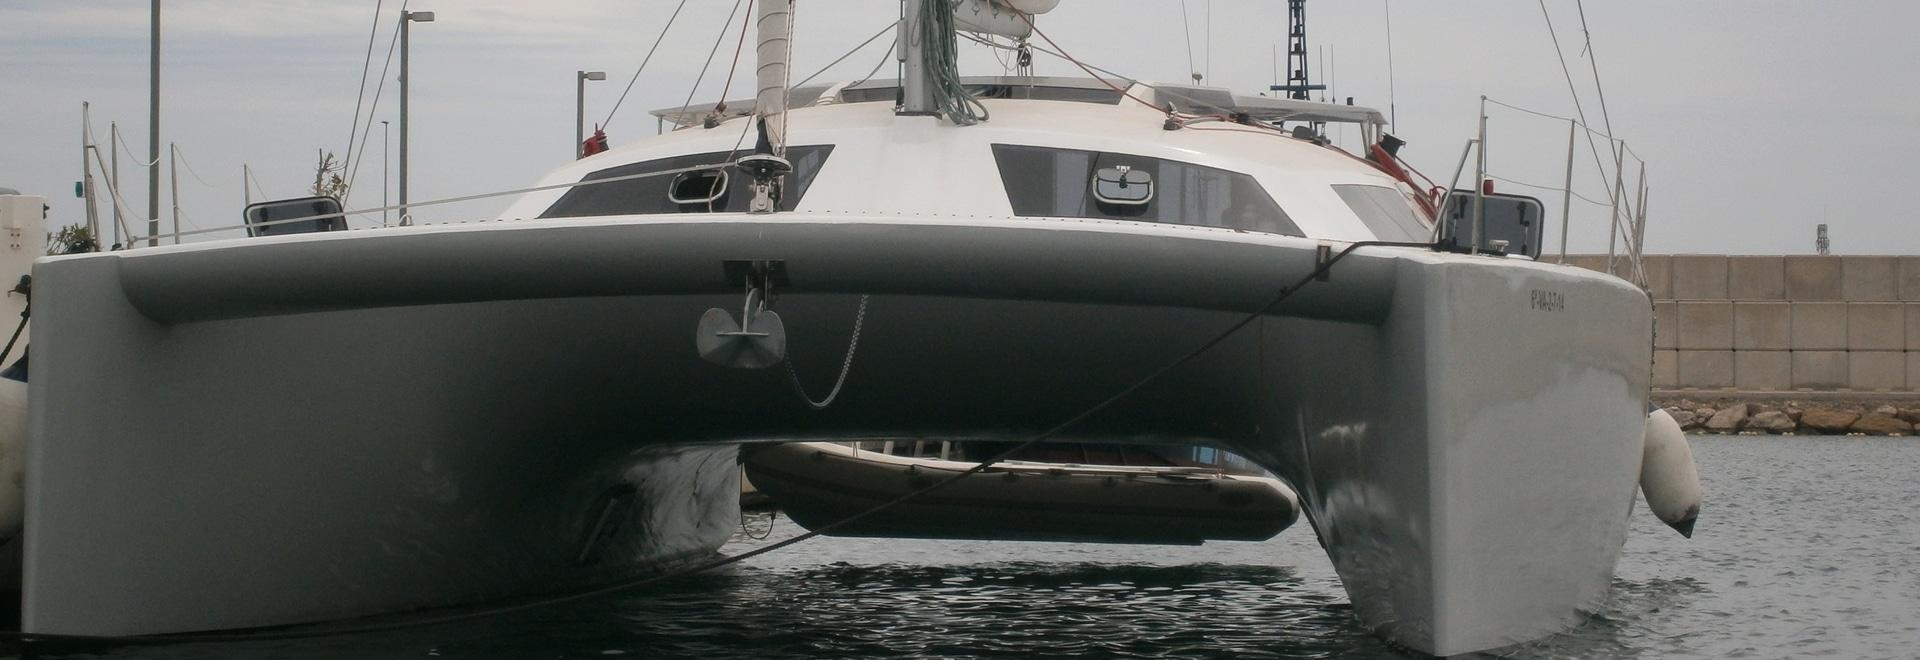 New Flash Cat 52 Sailing